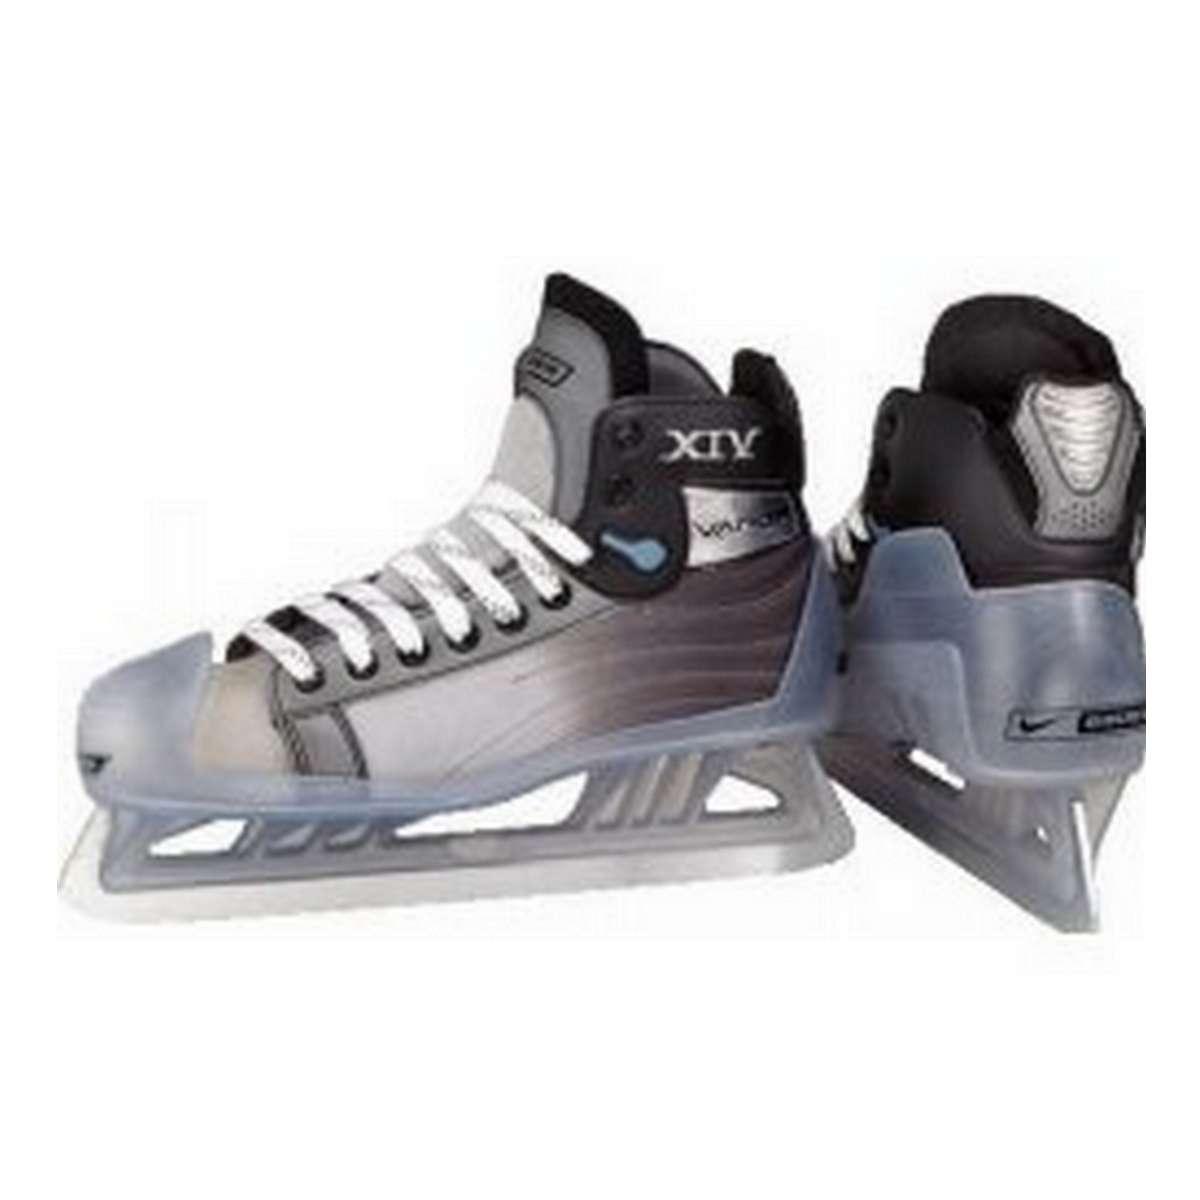 Brankárske korčule Nike Bauer Vapor XIV Jr - Sporthockey.sk 1e5c12a54c0